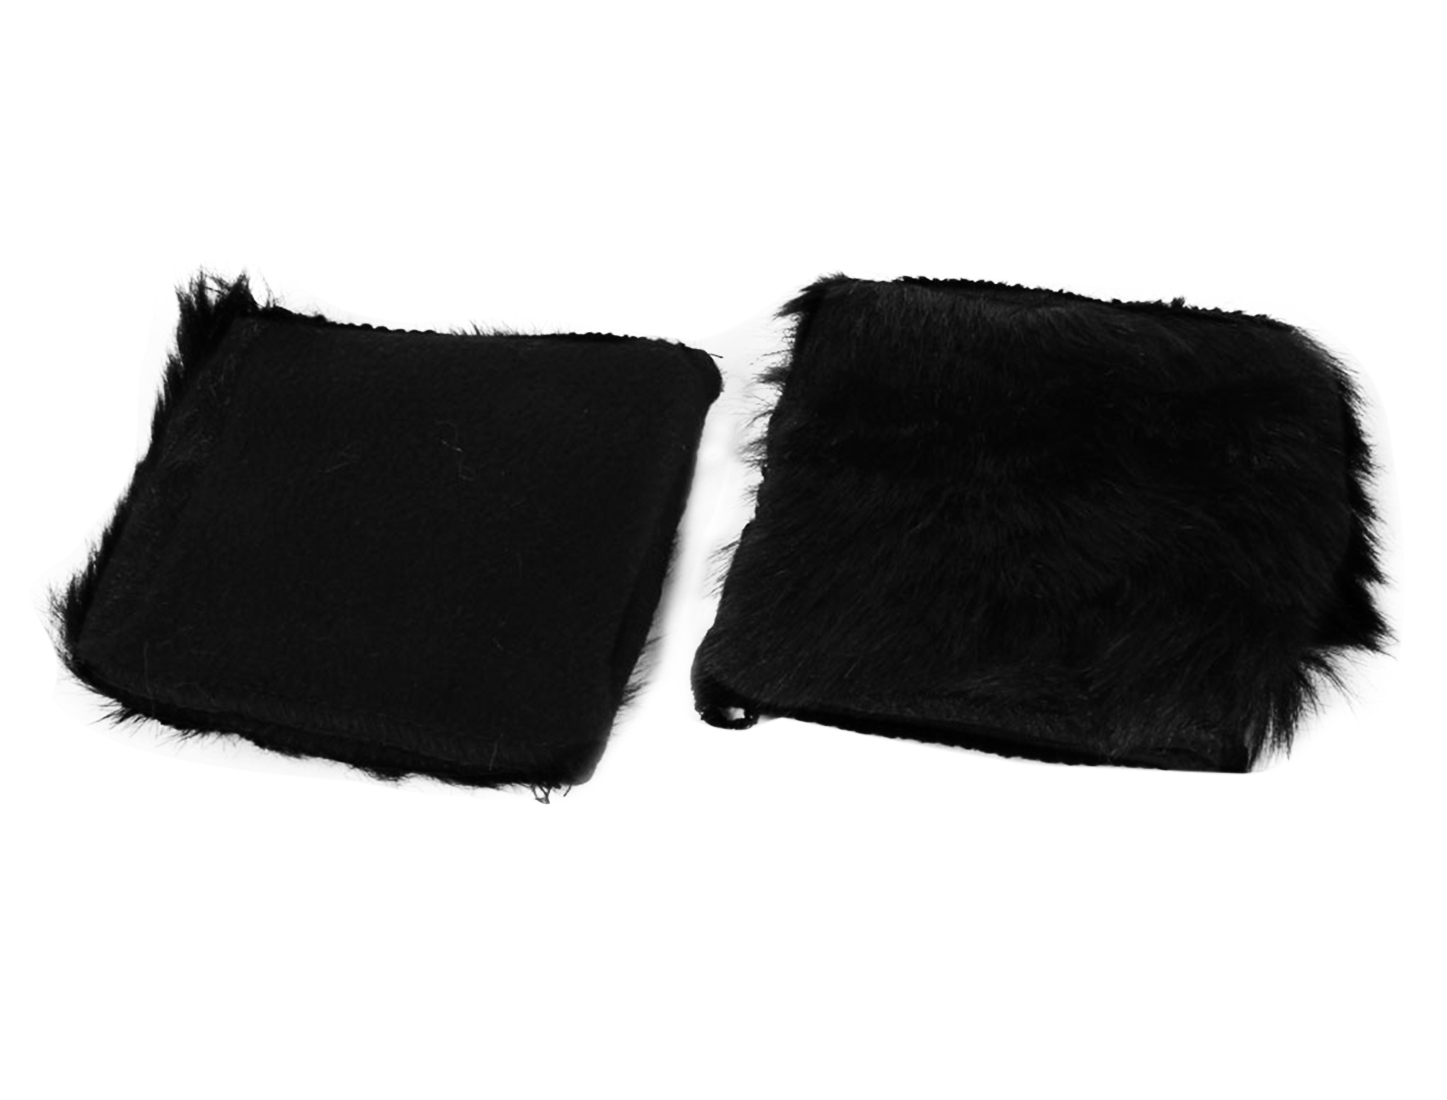 Black Faux Fur Winter Warm Semi-finger Computer Short Gloves Pair for Ladies